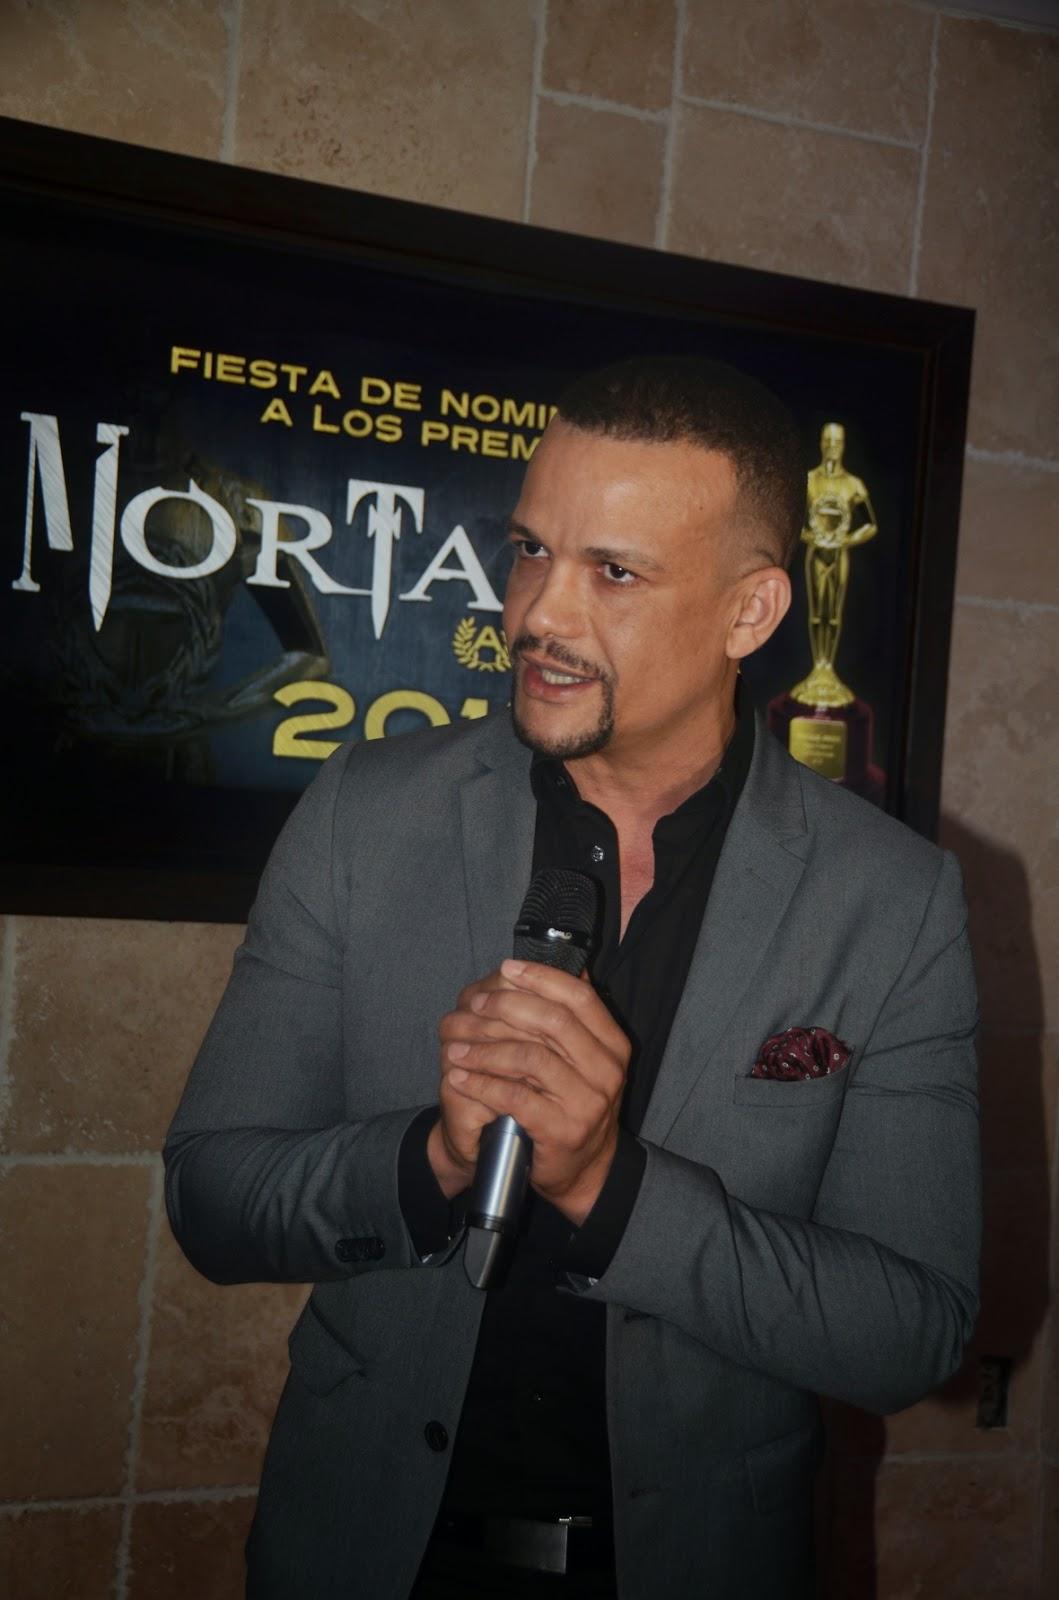 Serie Dominicana Mortales la Serie Mortales Nomina